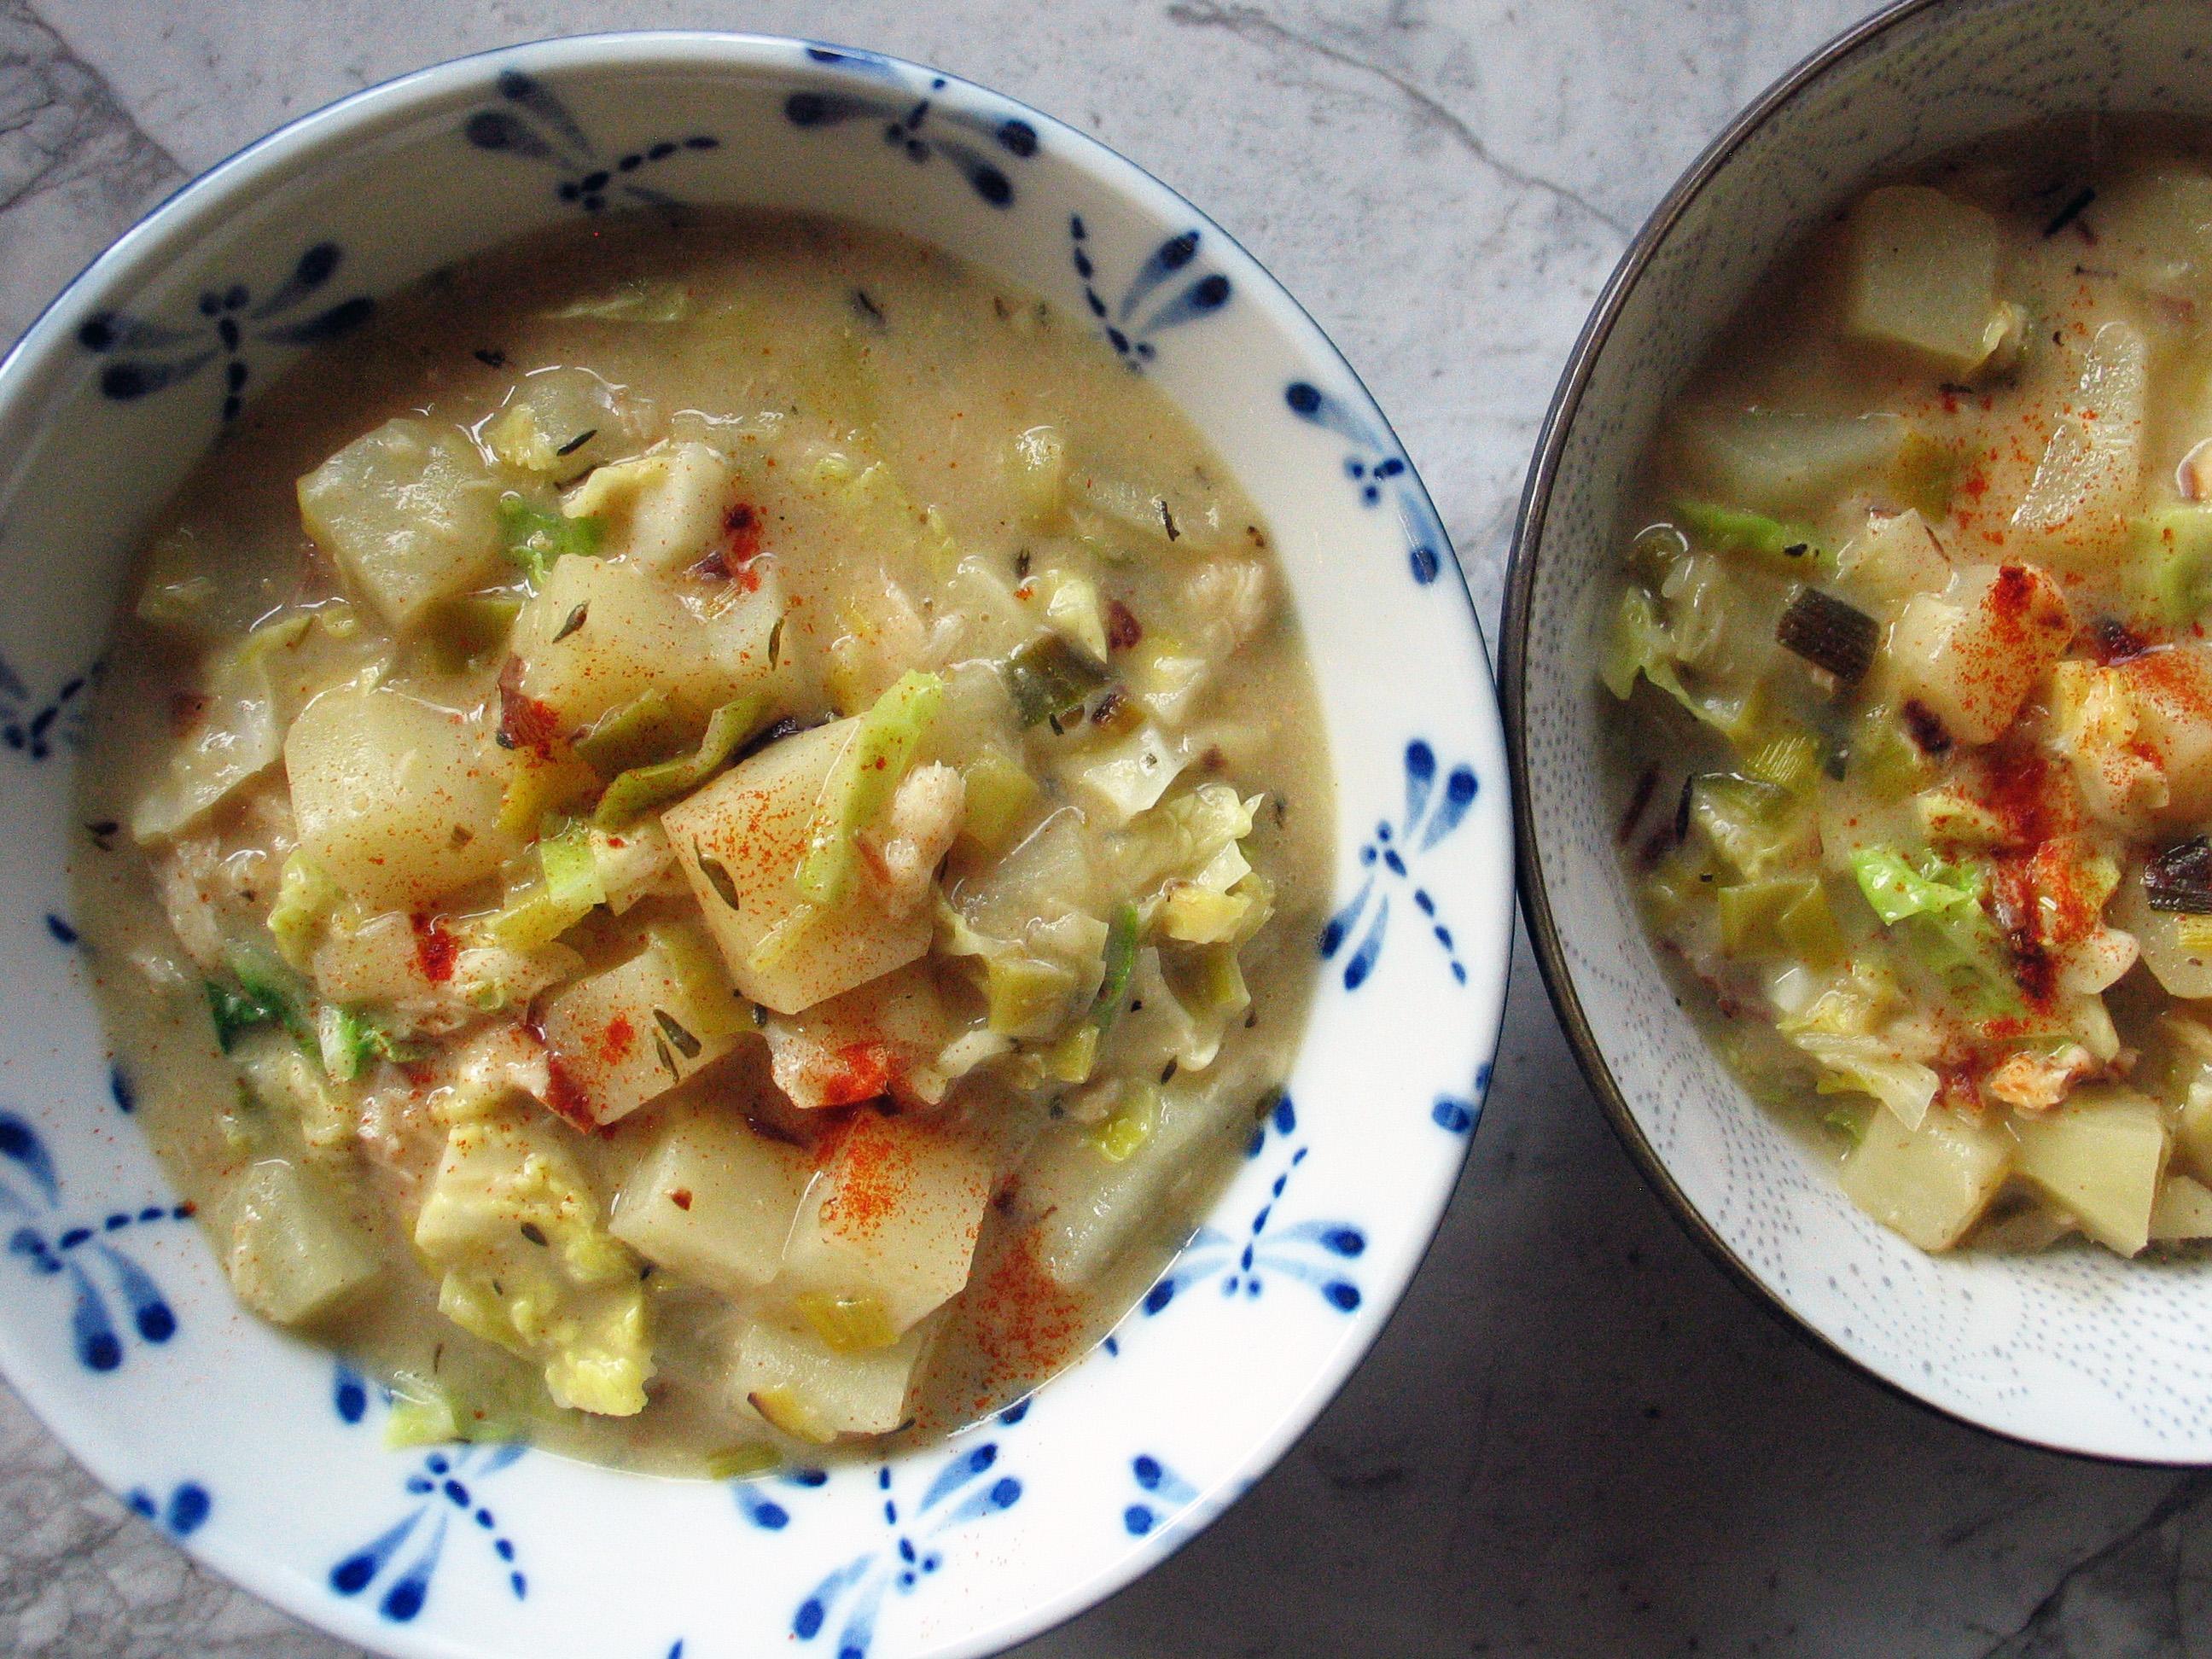 Cabbage and Smoked Fish Chowder